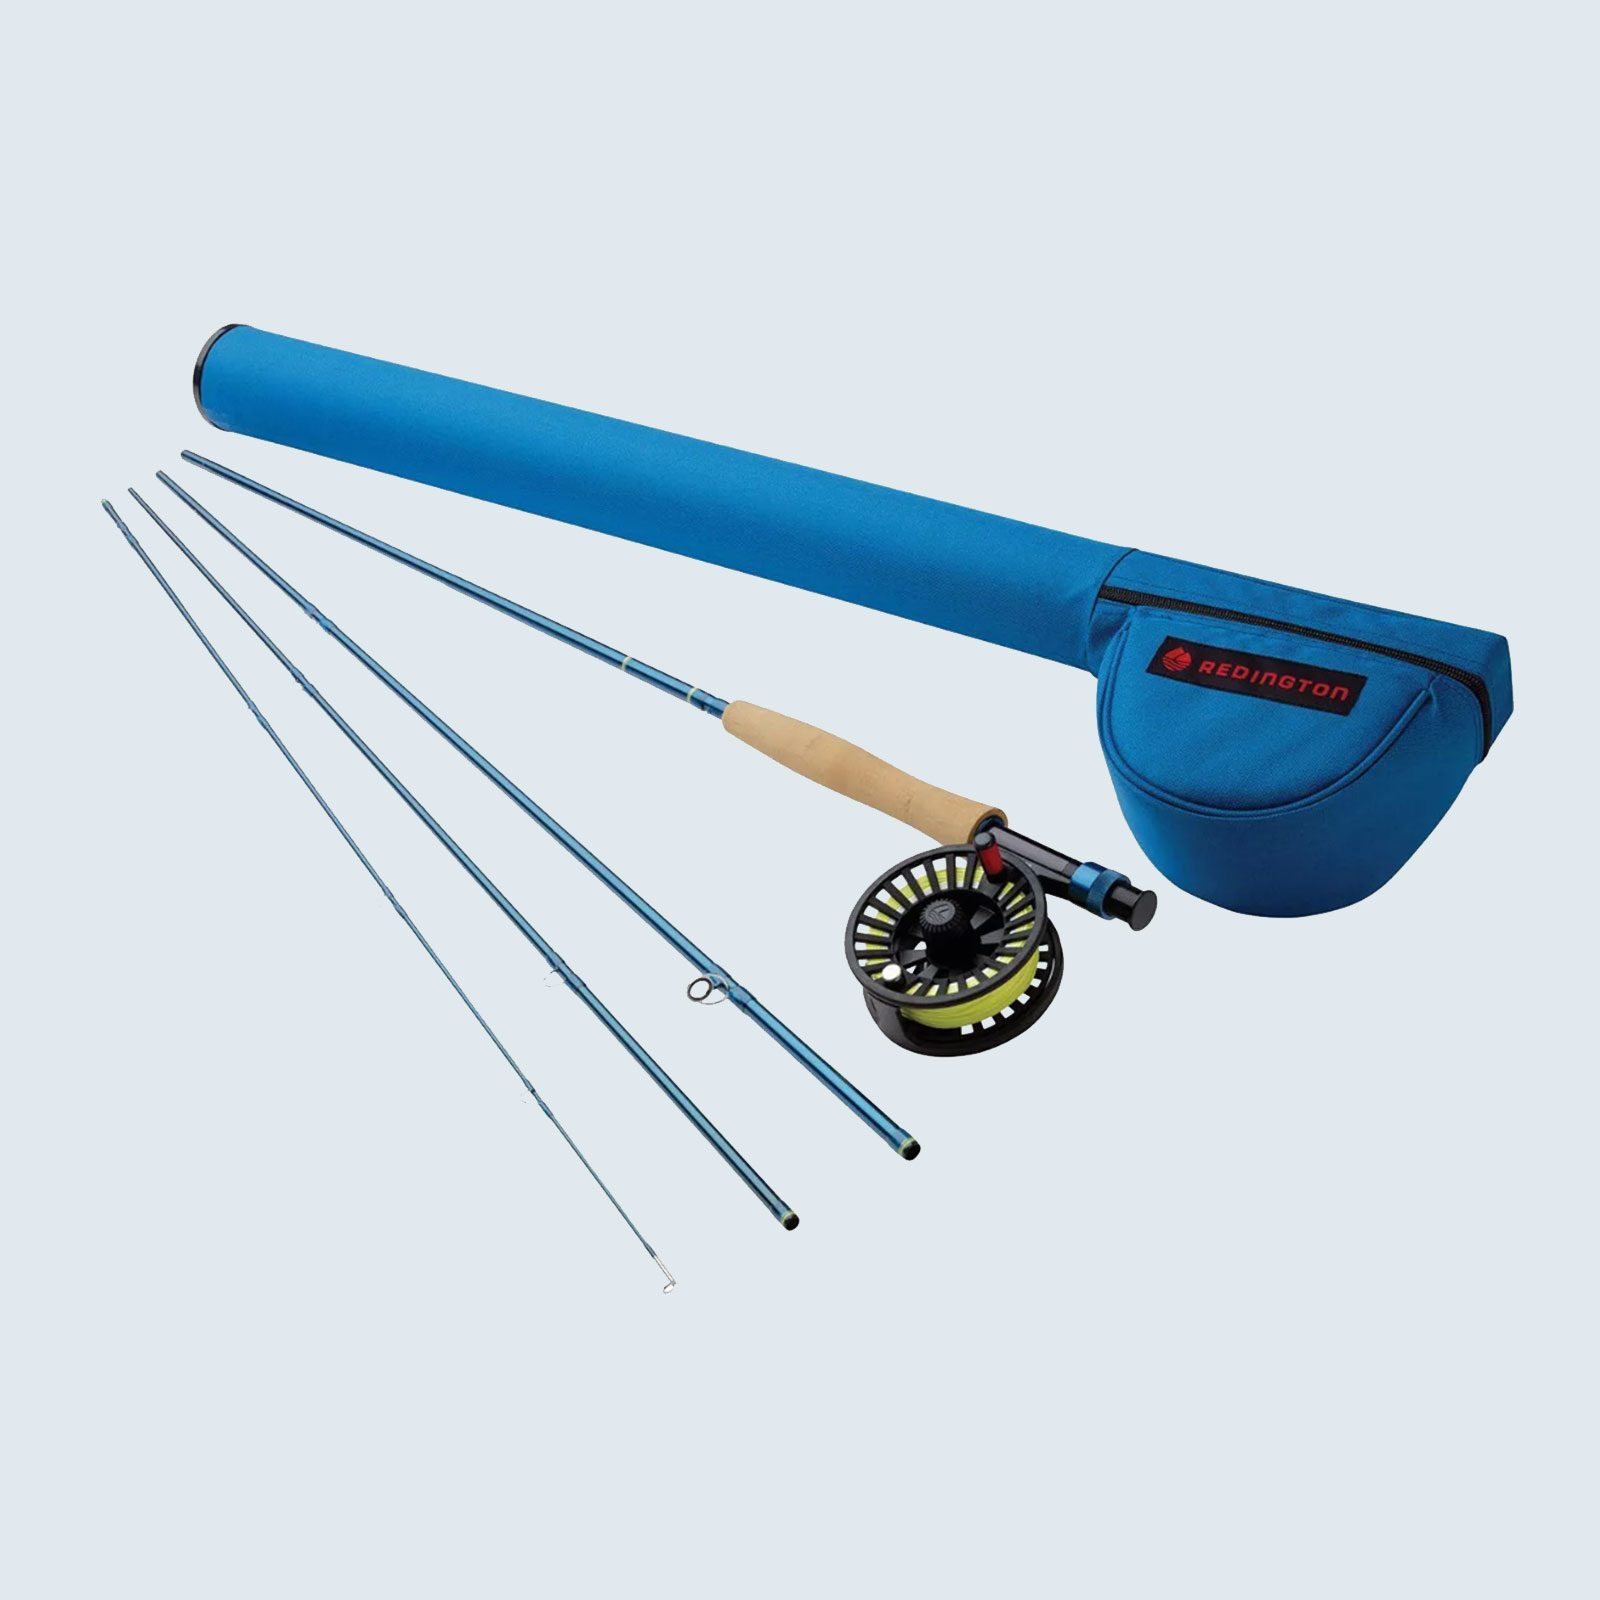 Redington Crosswater Fly Fishing Rod and Reel Combo